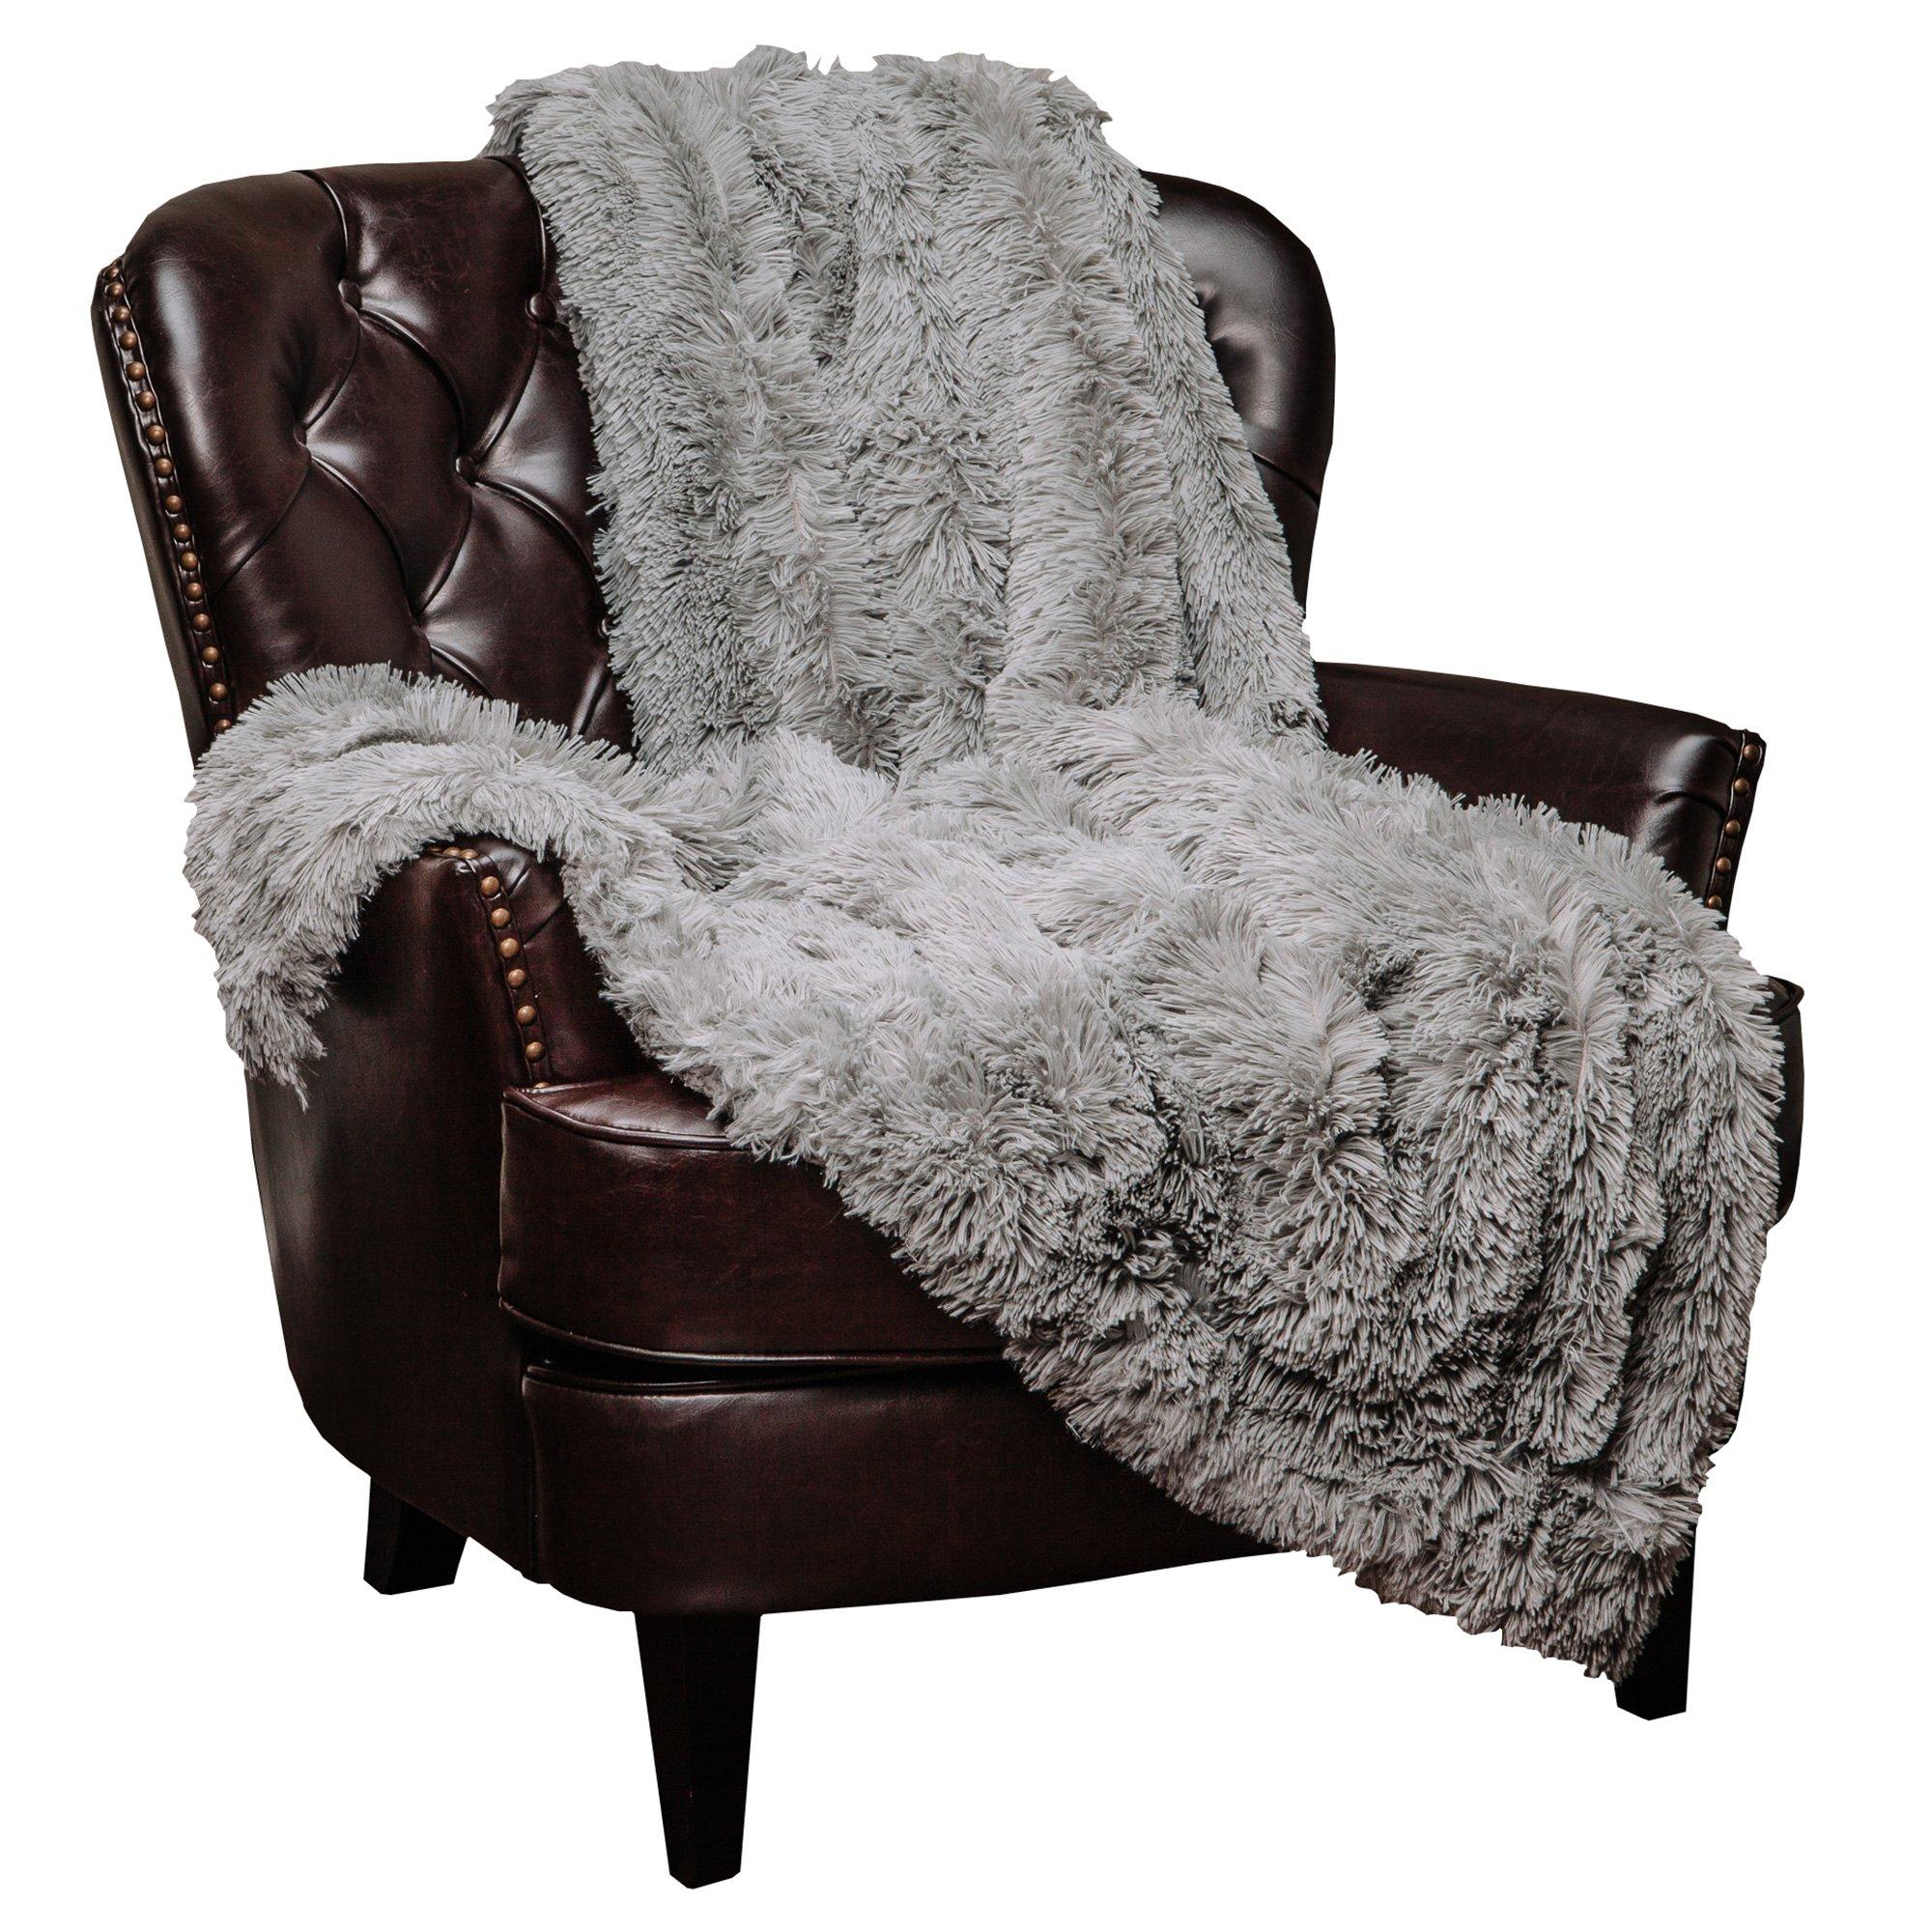 Chanasya Super Soft Shaggy Longfur Throw Blanket   Snuggly Fuzzy Faux Fur Lightweight Warm Elegant Cozy Plush Sherpa Microfiber Blanket   for Couch Bed Chair Photo Props - 50''x 65'' - Grey